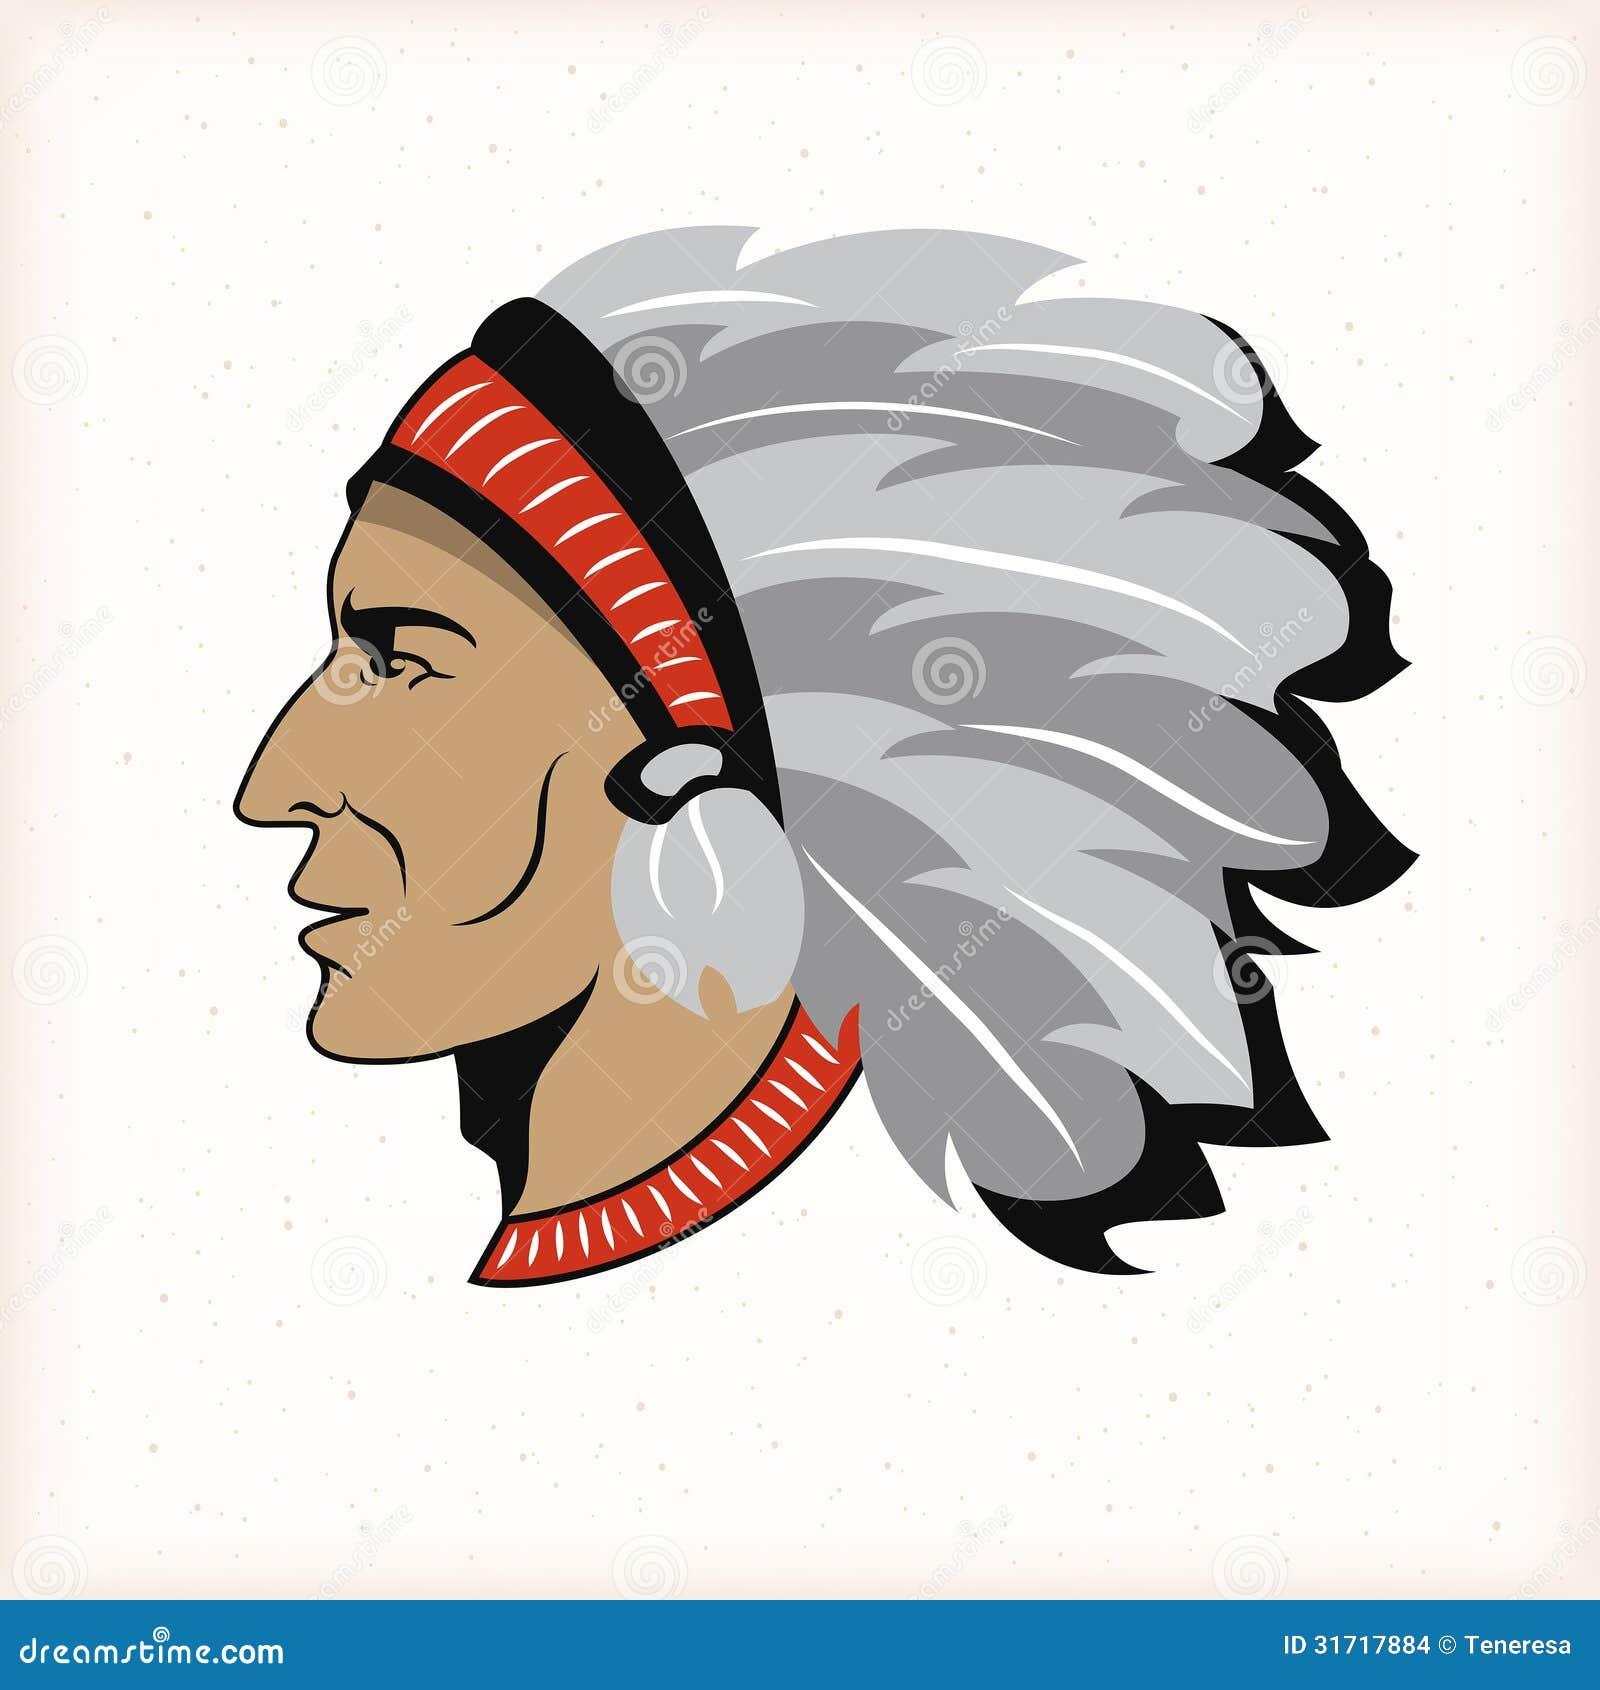 Indian Head Mascot Indian head mascot